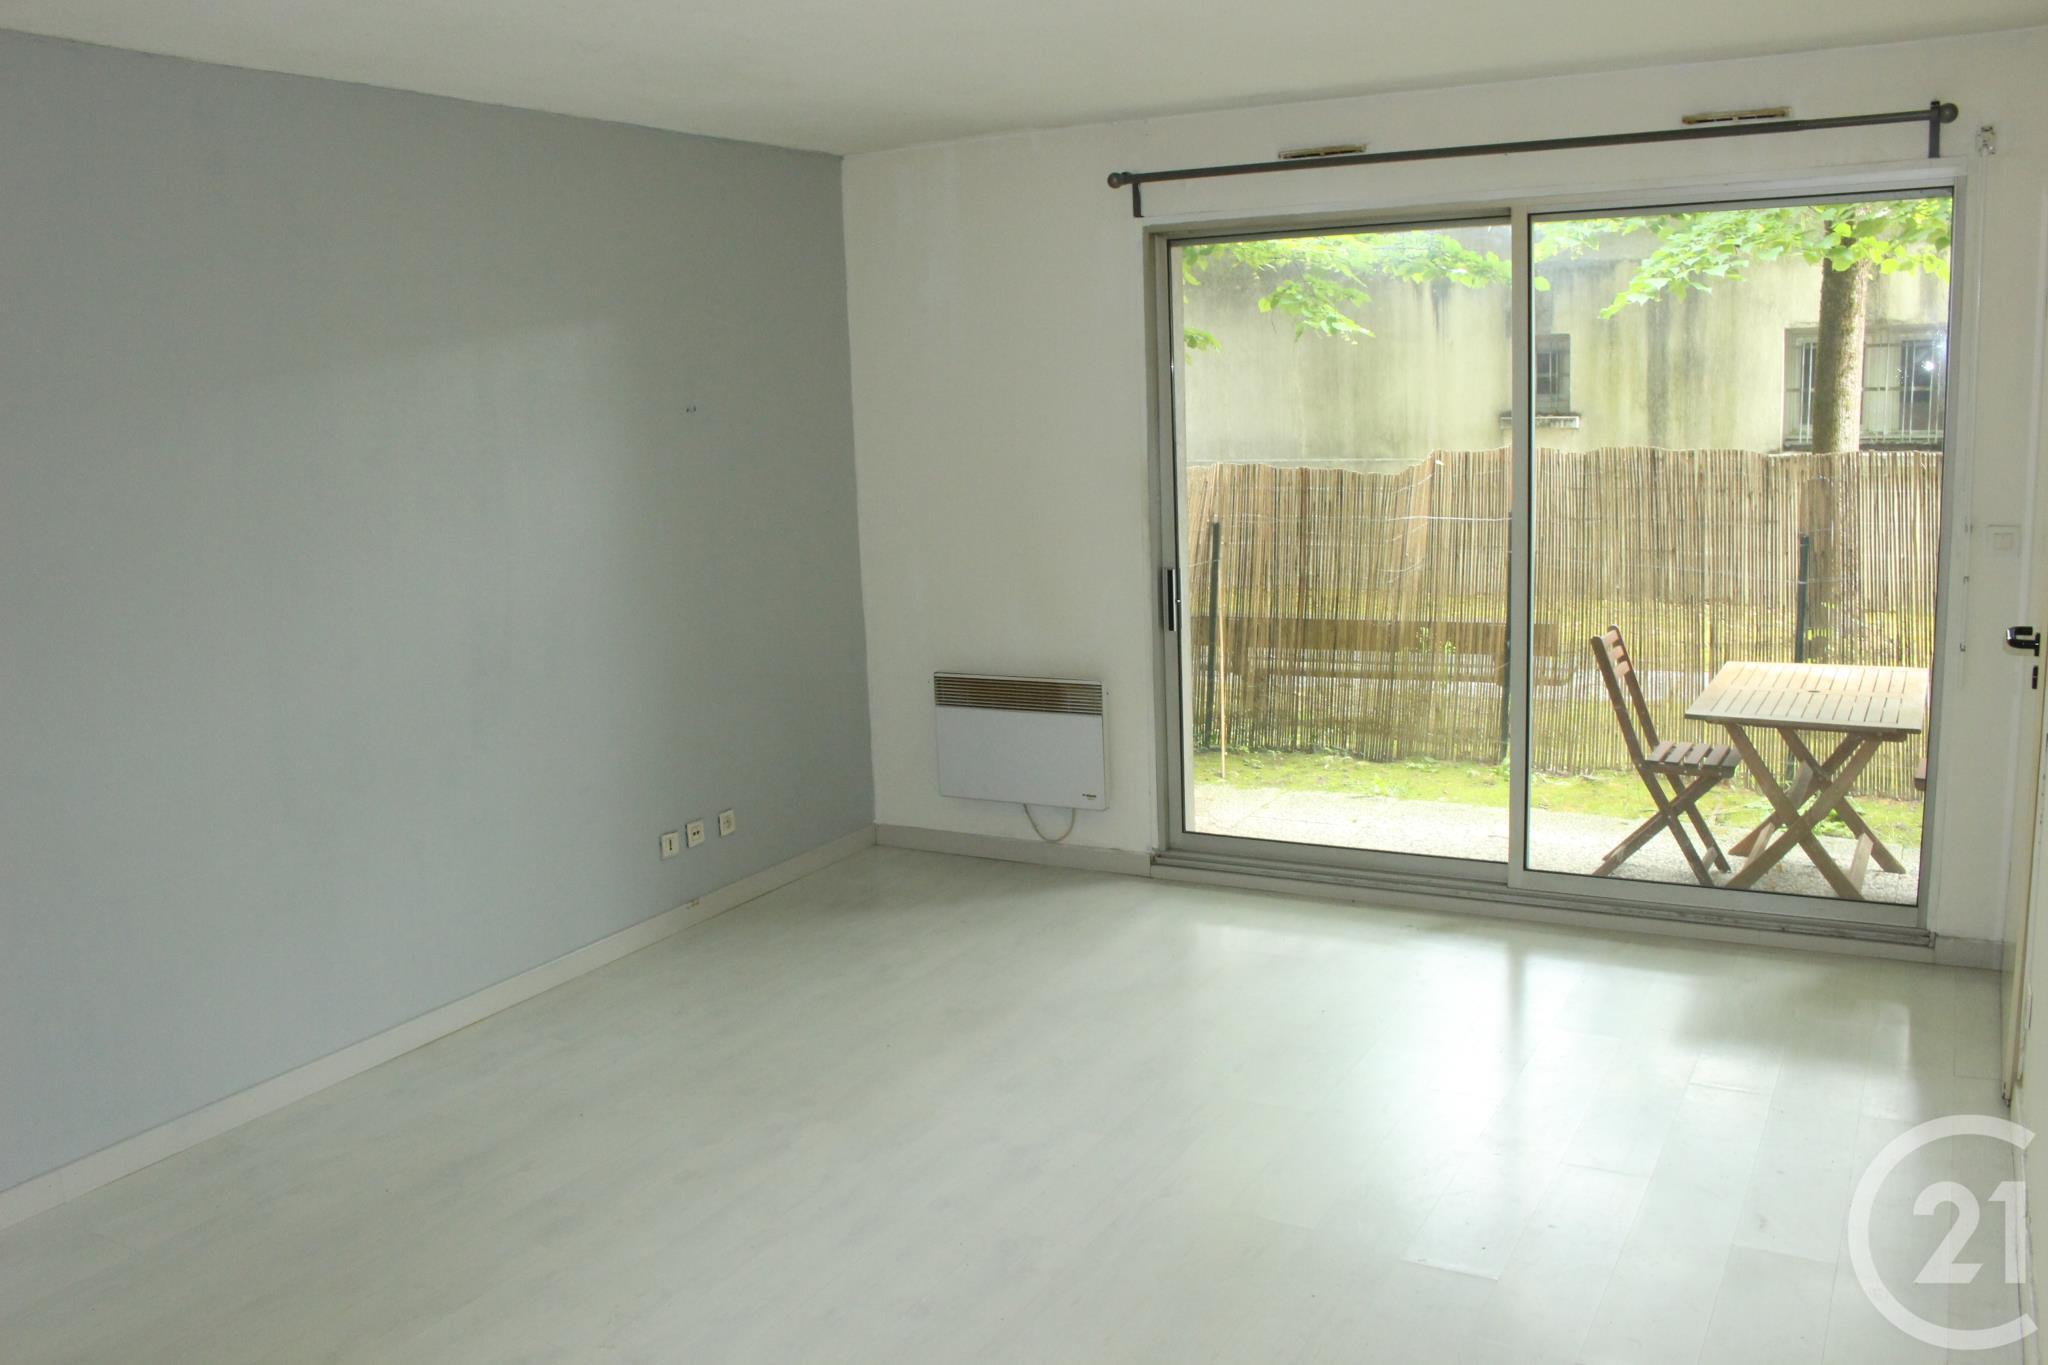 appartement f1 vendre 1 pi ce 31 m2 toulouse 31. Black Bedroom Furniture Sets. Home Design Ideas